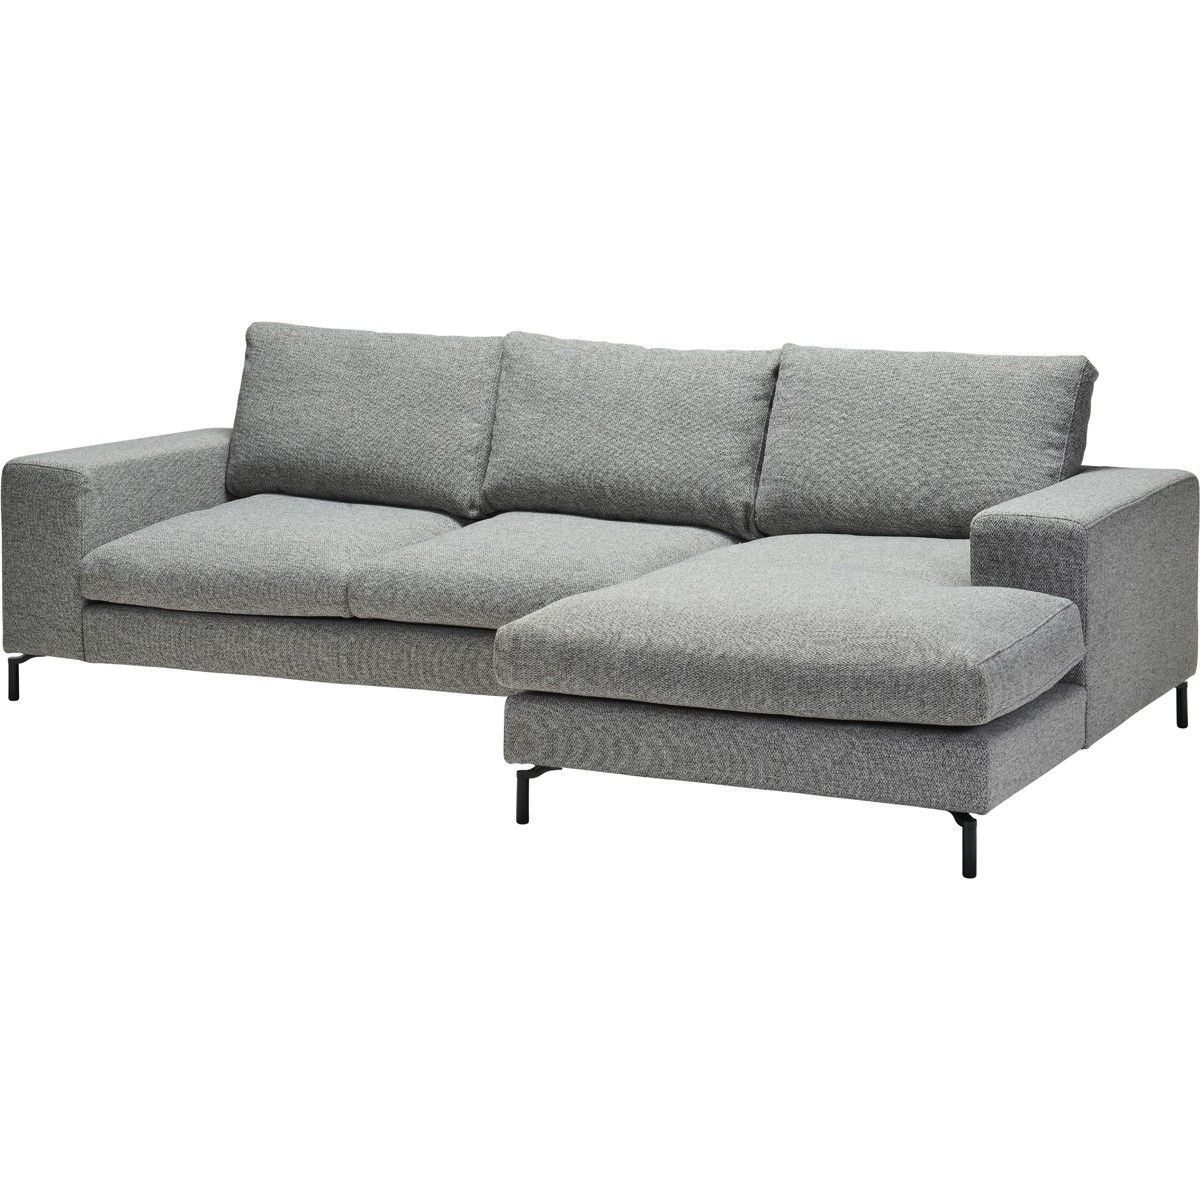 Sofa Bed Kwantum.Hockers Kwantum Hocker Buiten Interesting Interieur Exterieur